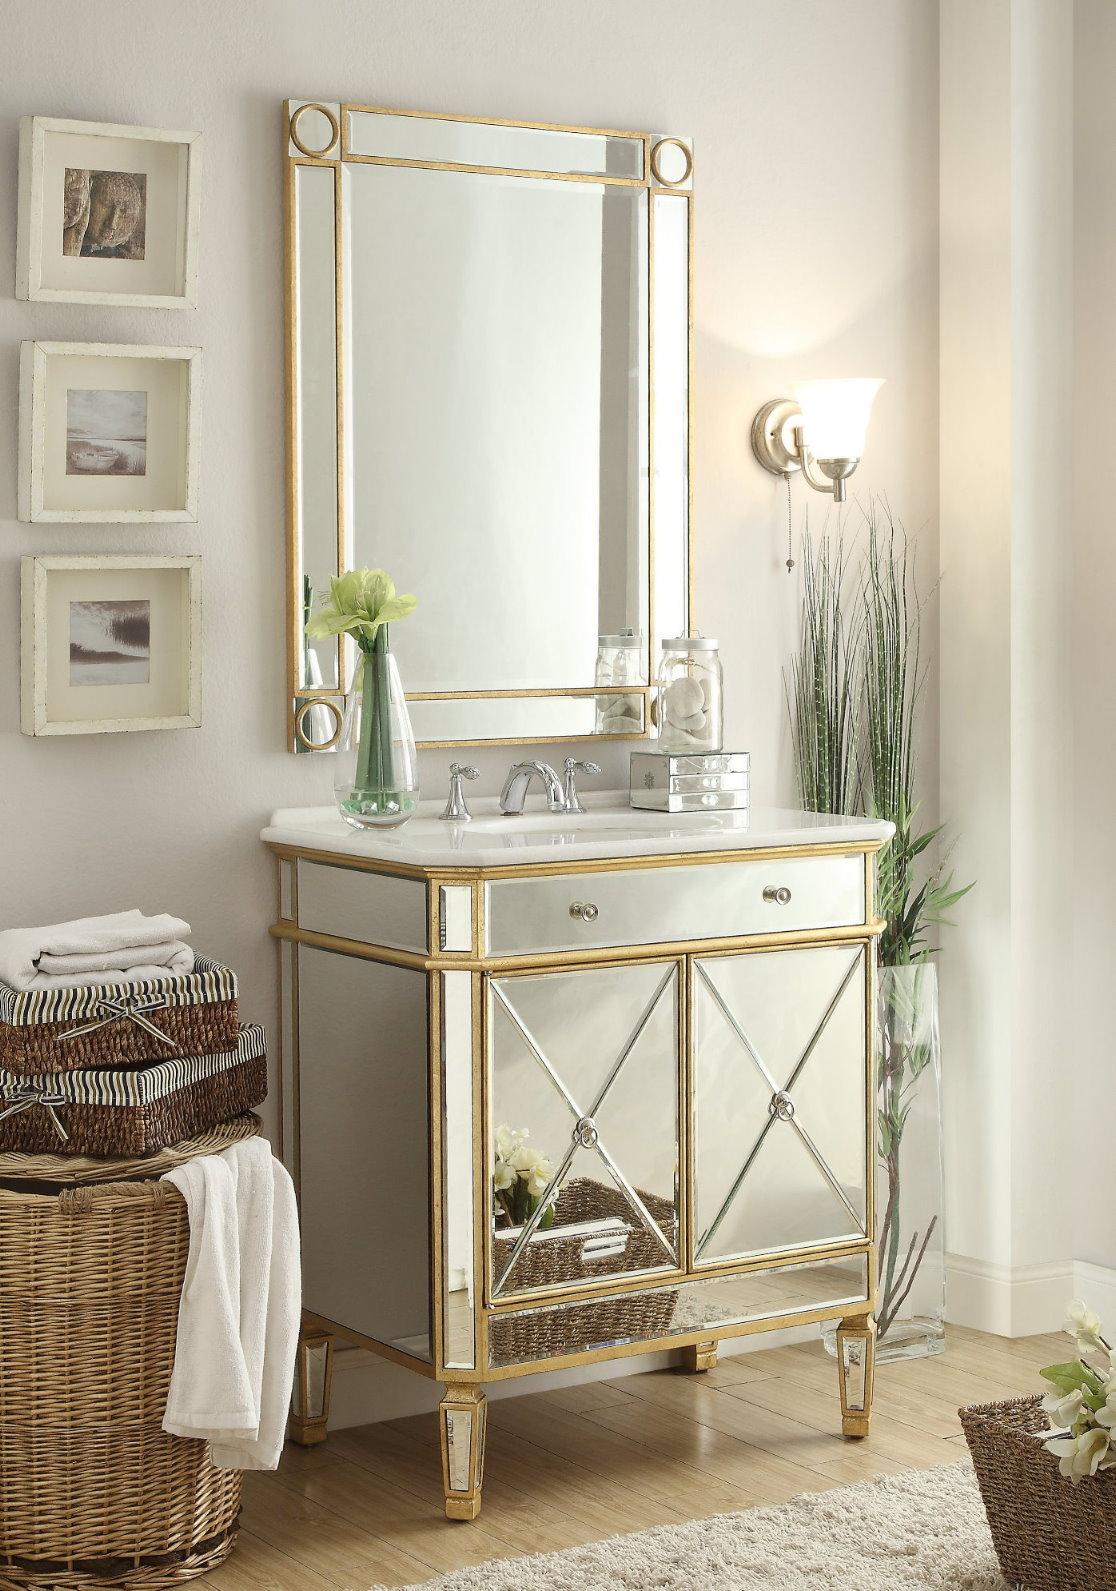 32 inch Adelina Mirrored Gold Bathroom Vanity & Mirror